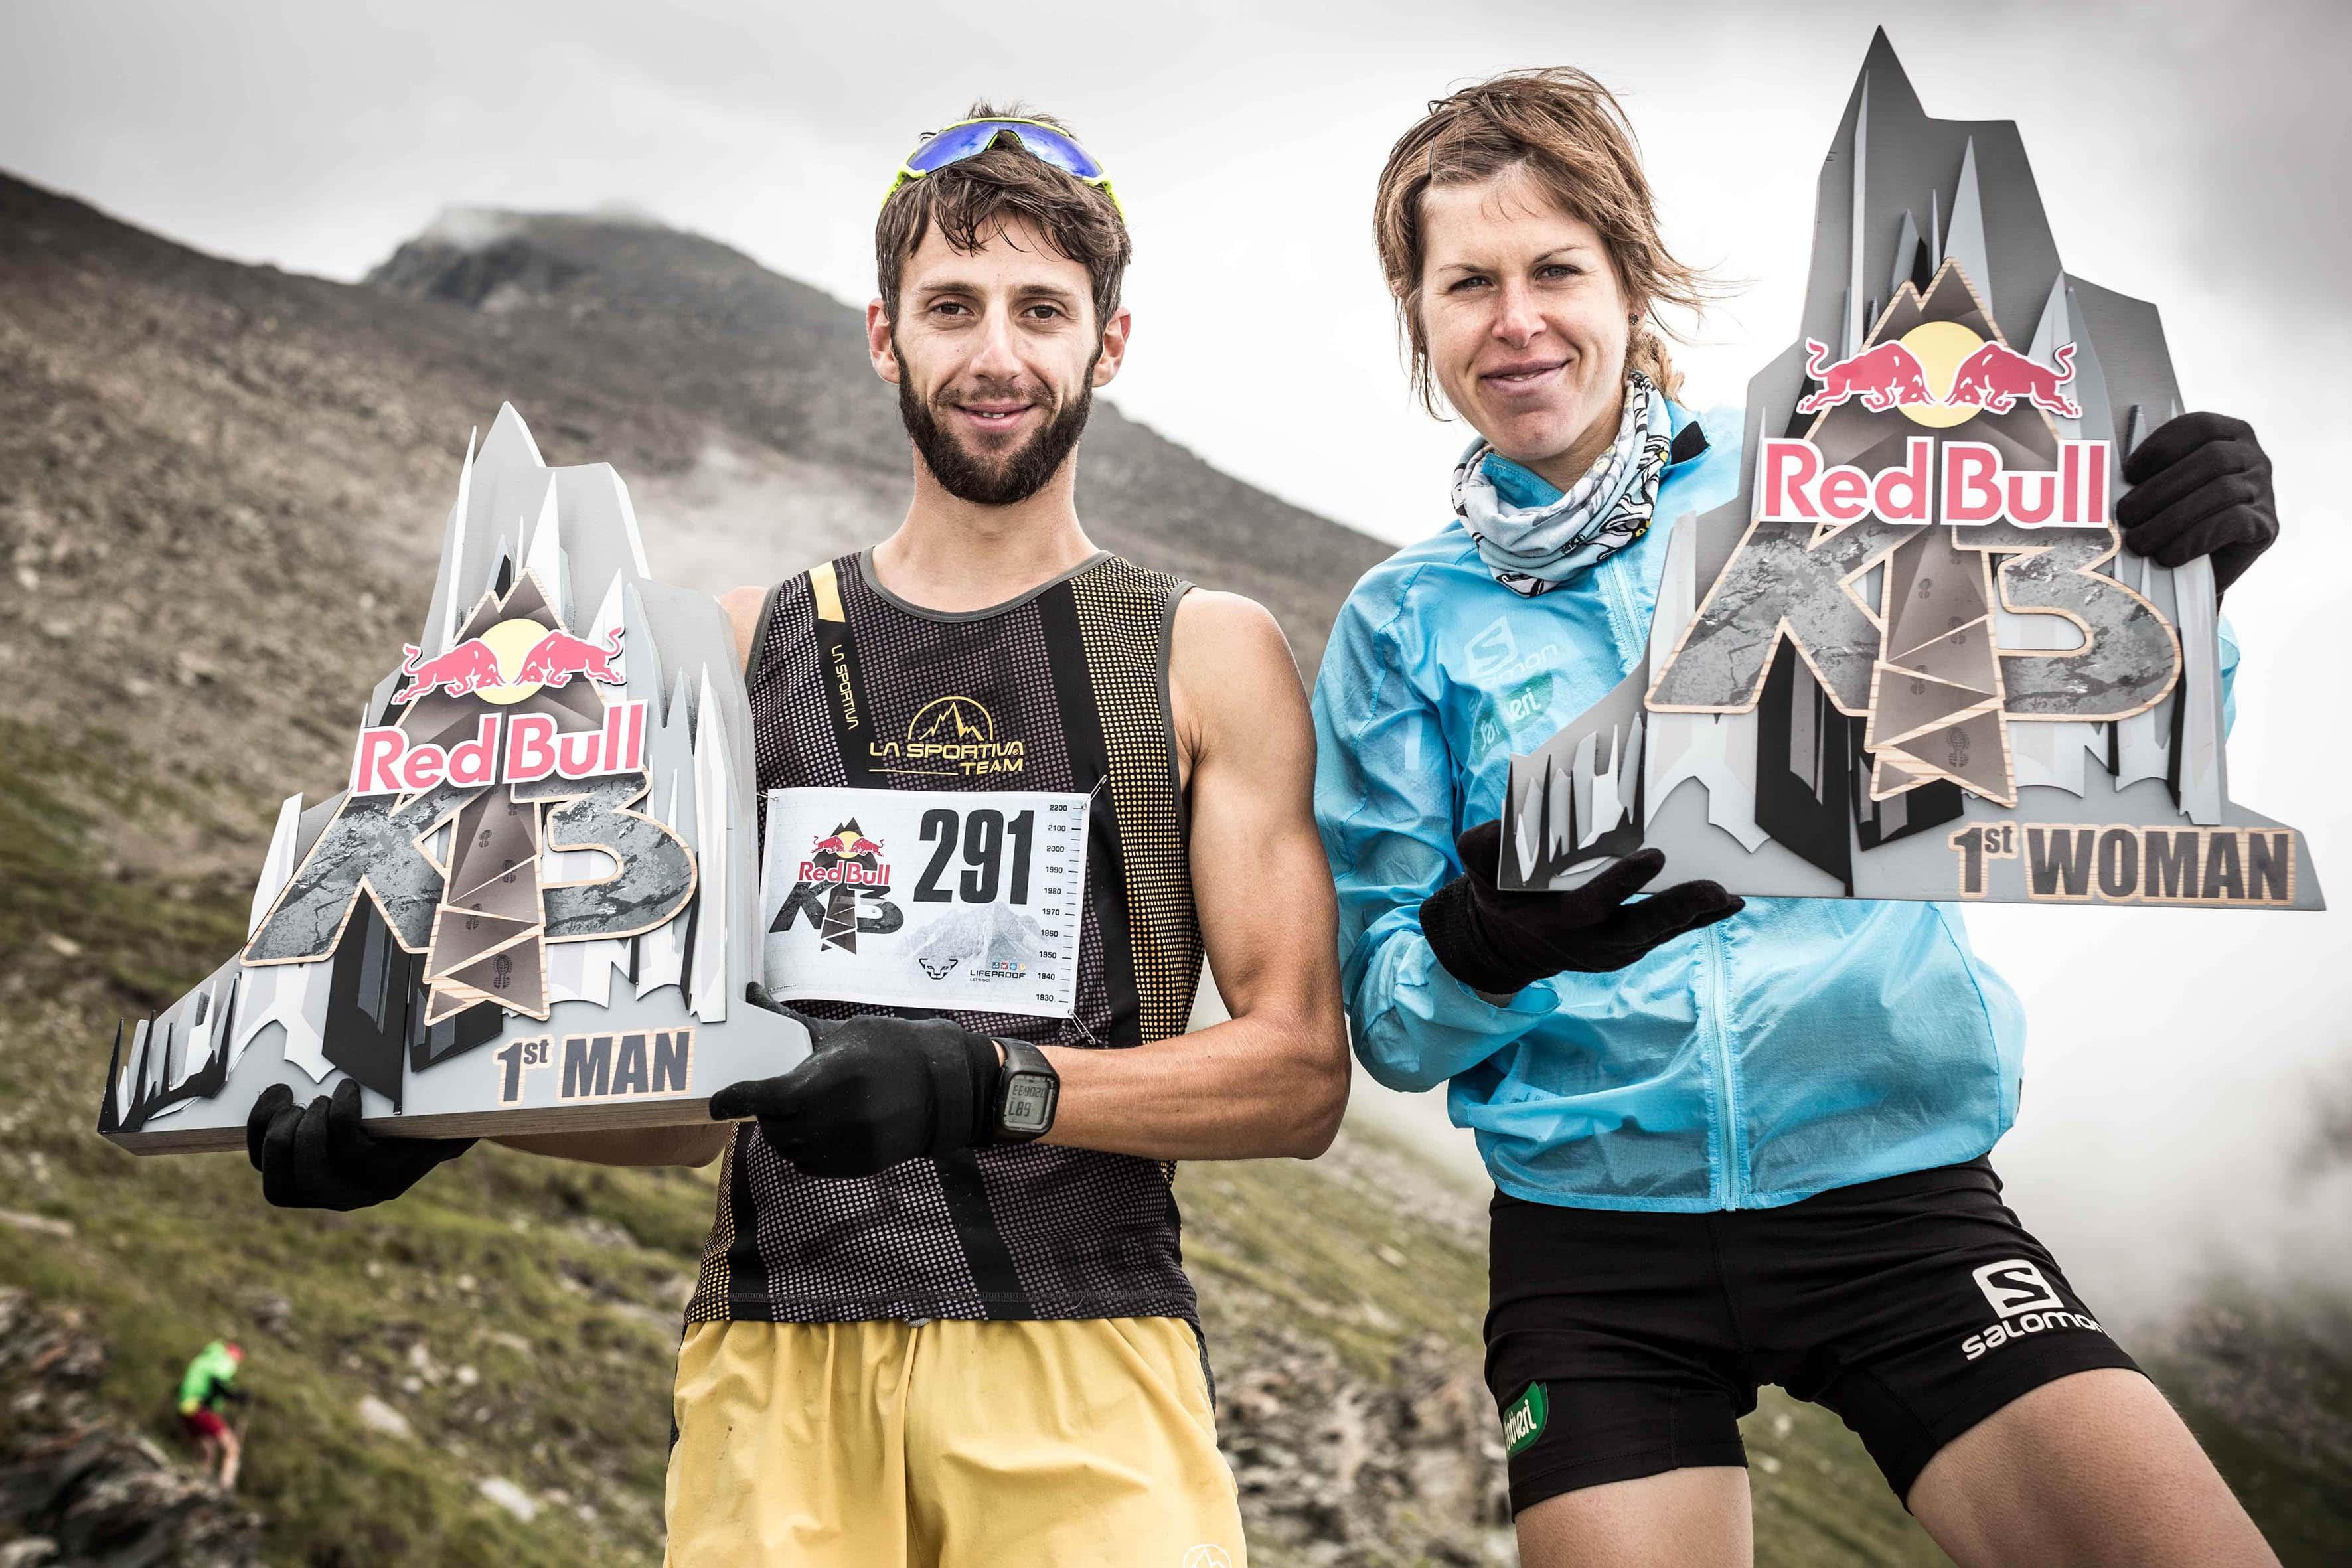 Foto: Red Bull - Laura Orgué y Marco Moletto